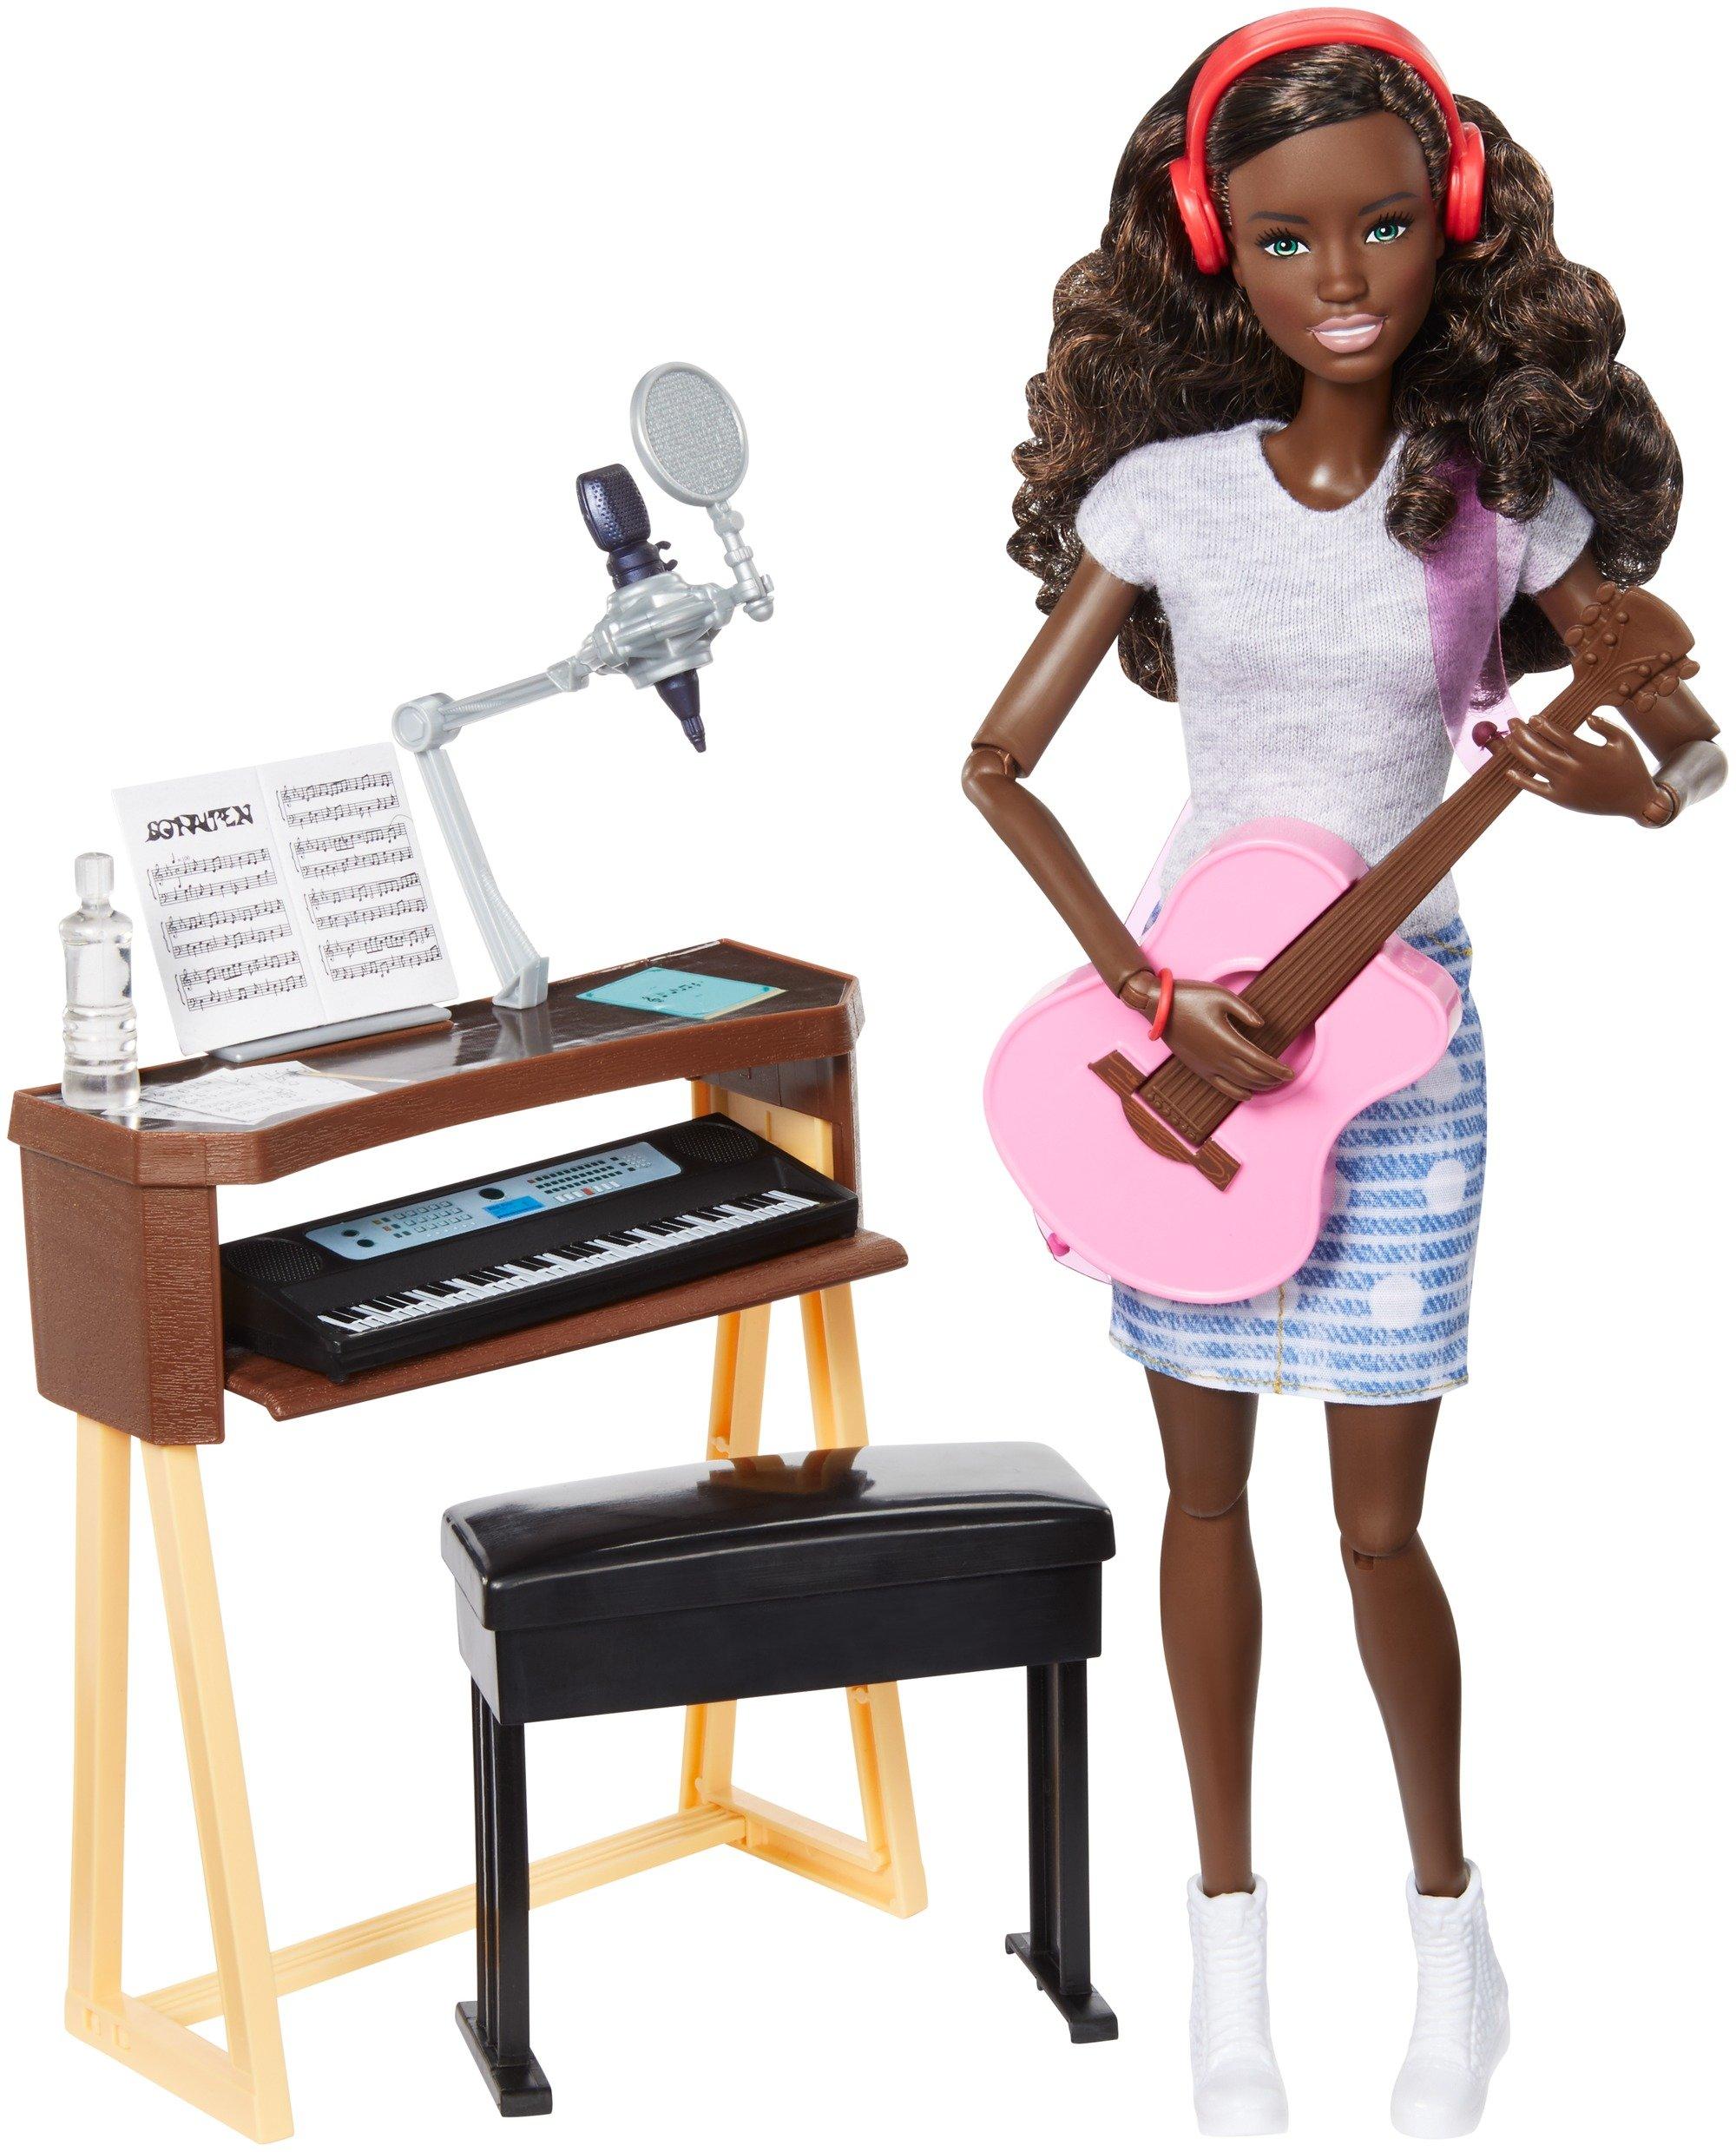 Barbie Musician Doll & Playset, Brunette